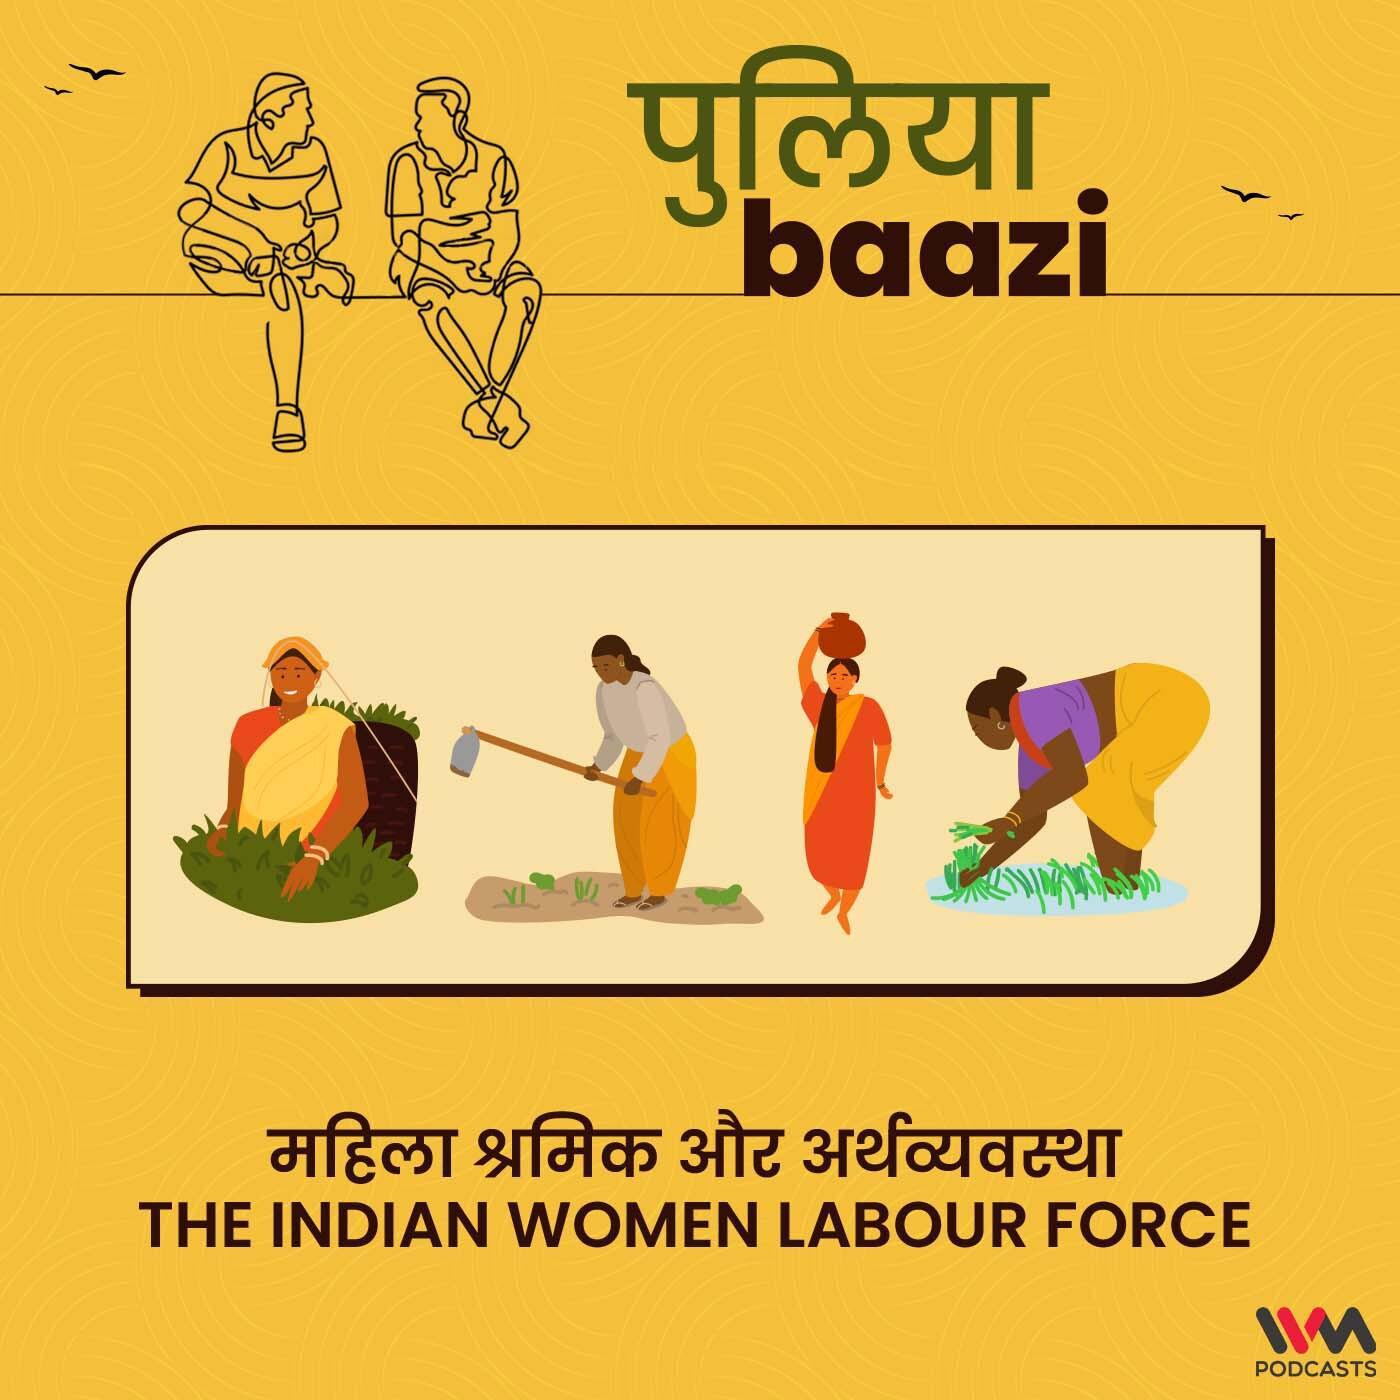 महिला श्रमिक और अर्थव्यवस्था The Indian Women Labour Force